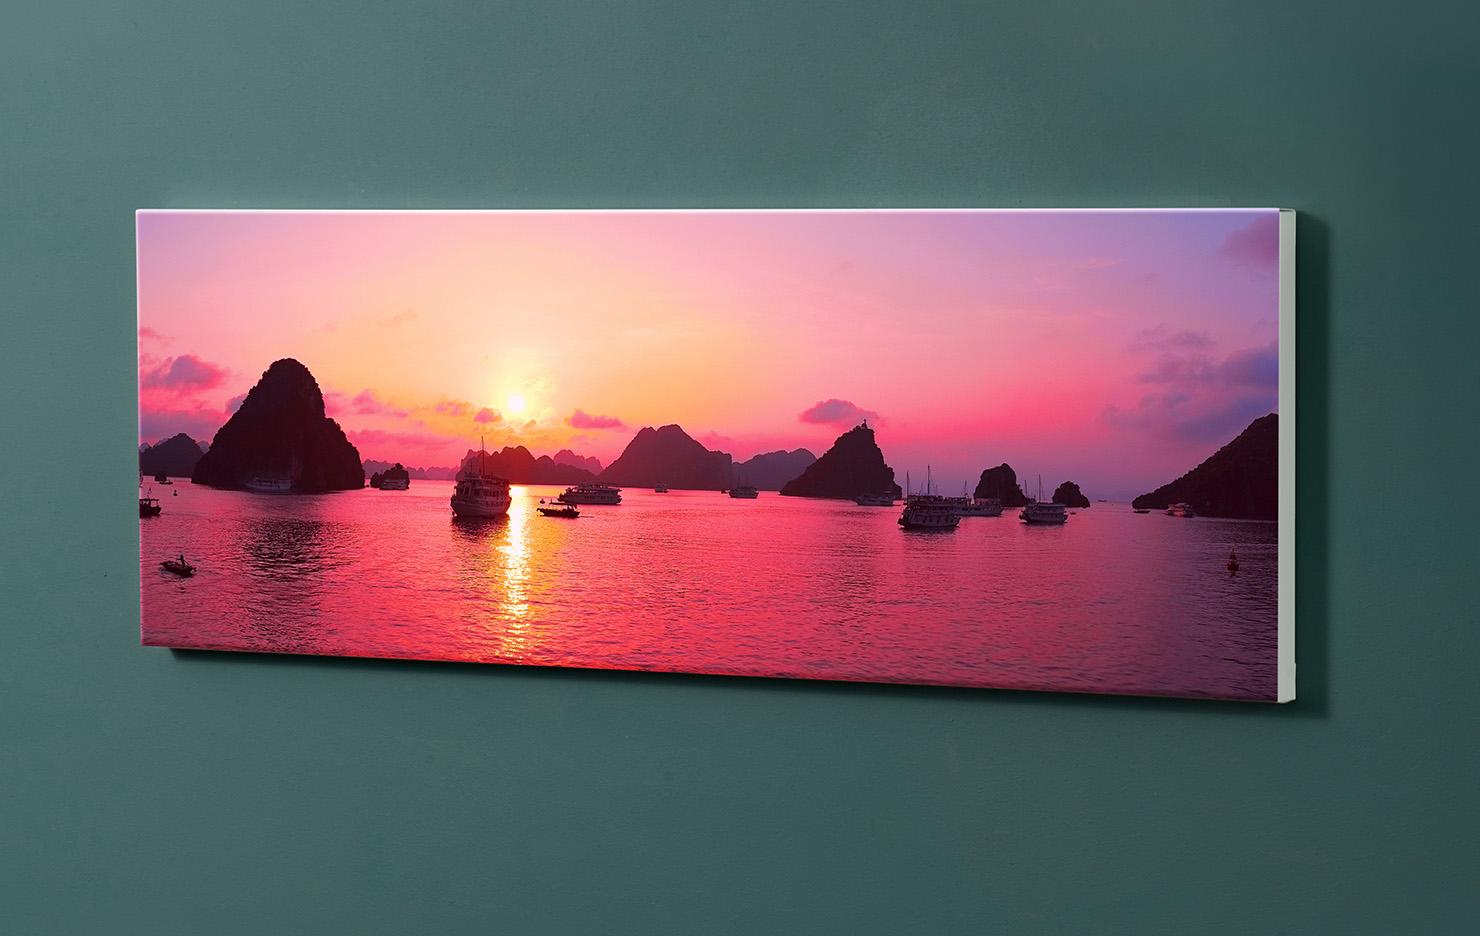 Magnettafel NOTIZ 90x30cm Motiv-Pinnwand M136 Sonnenuntergang